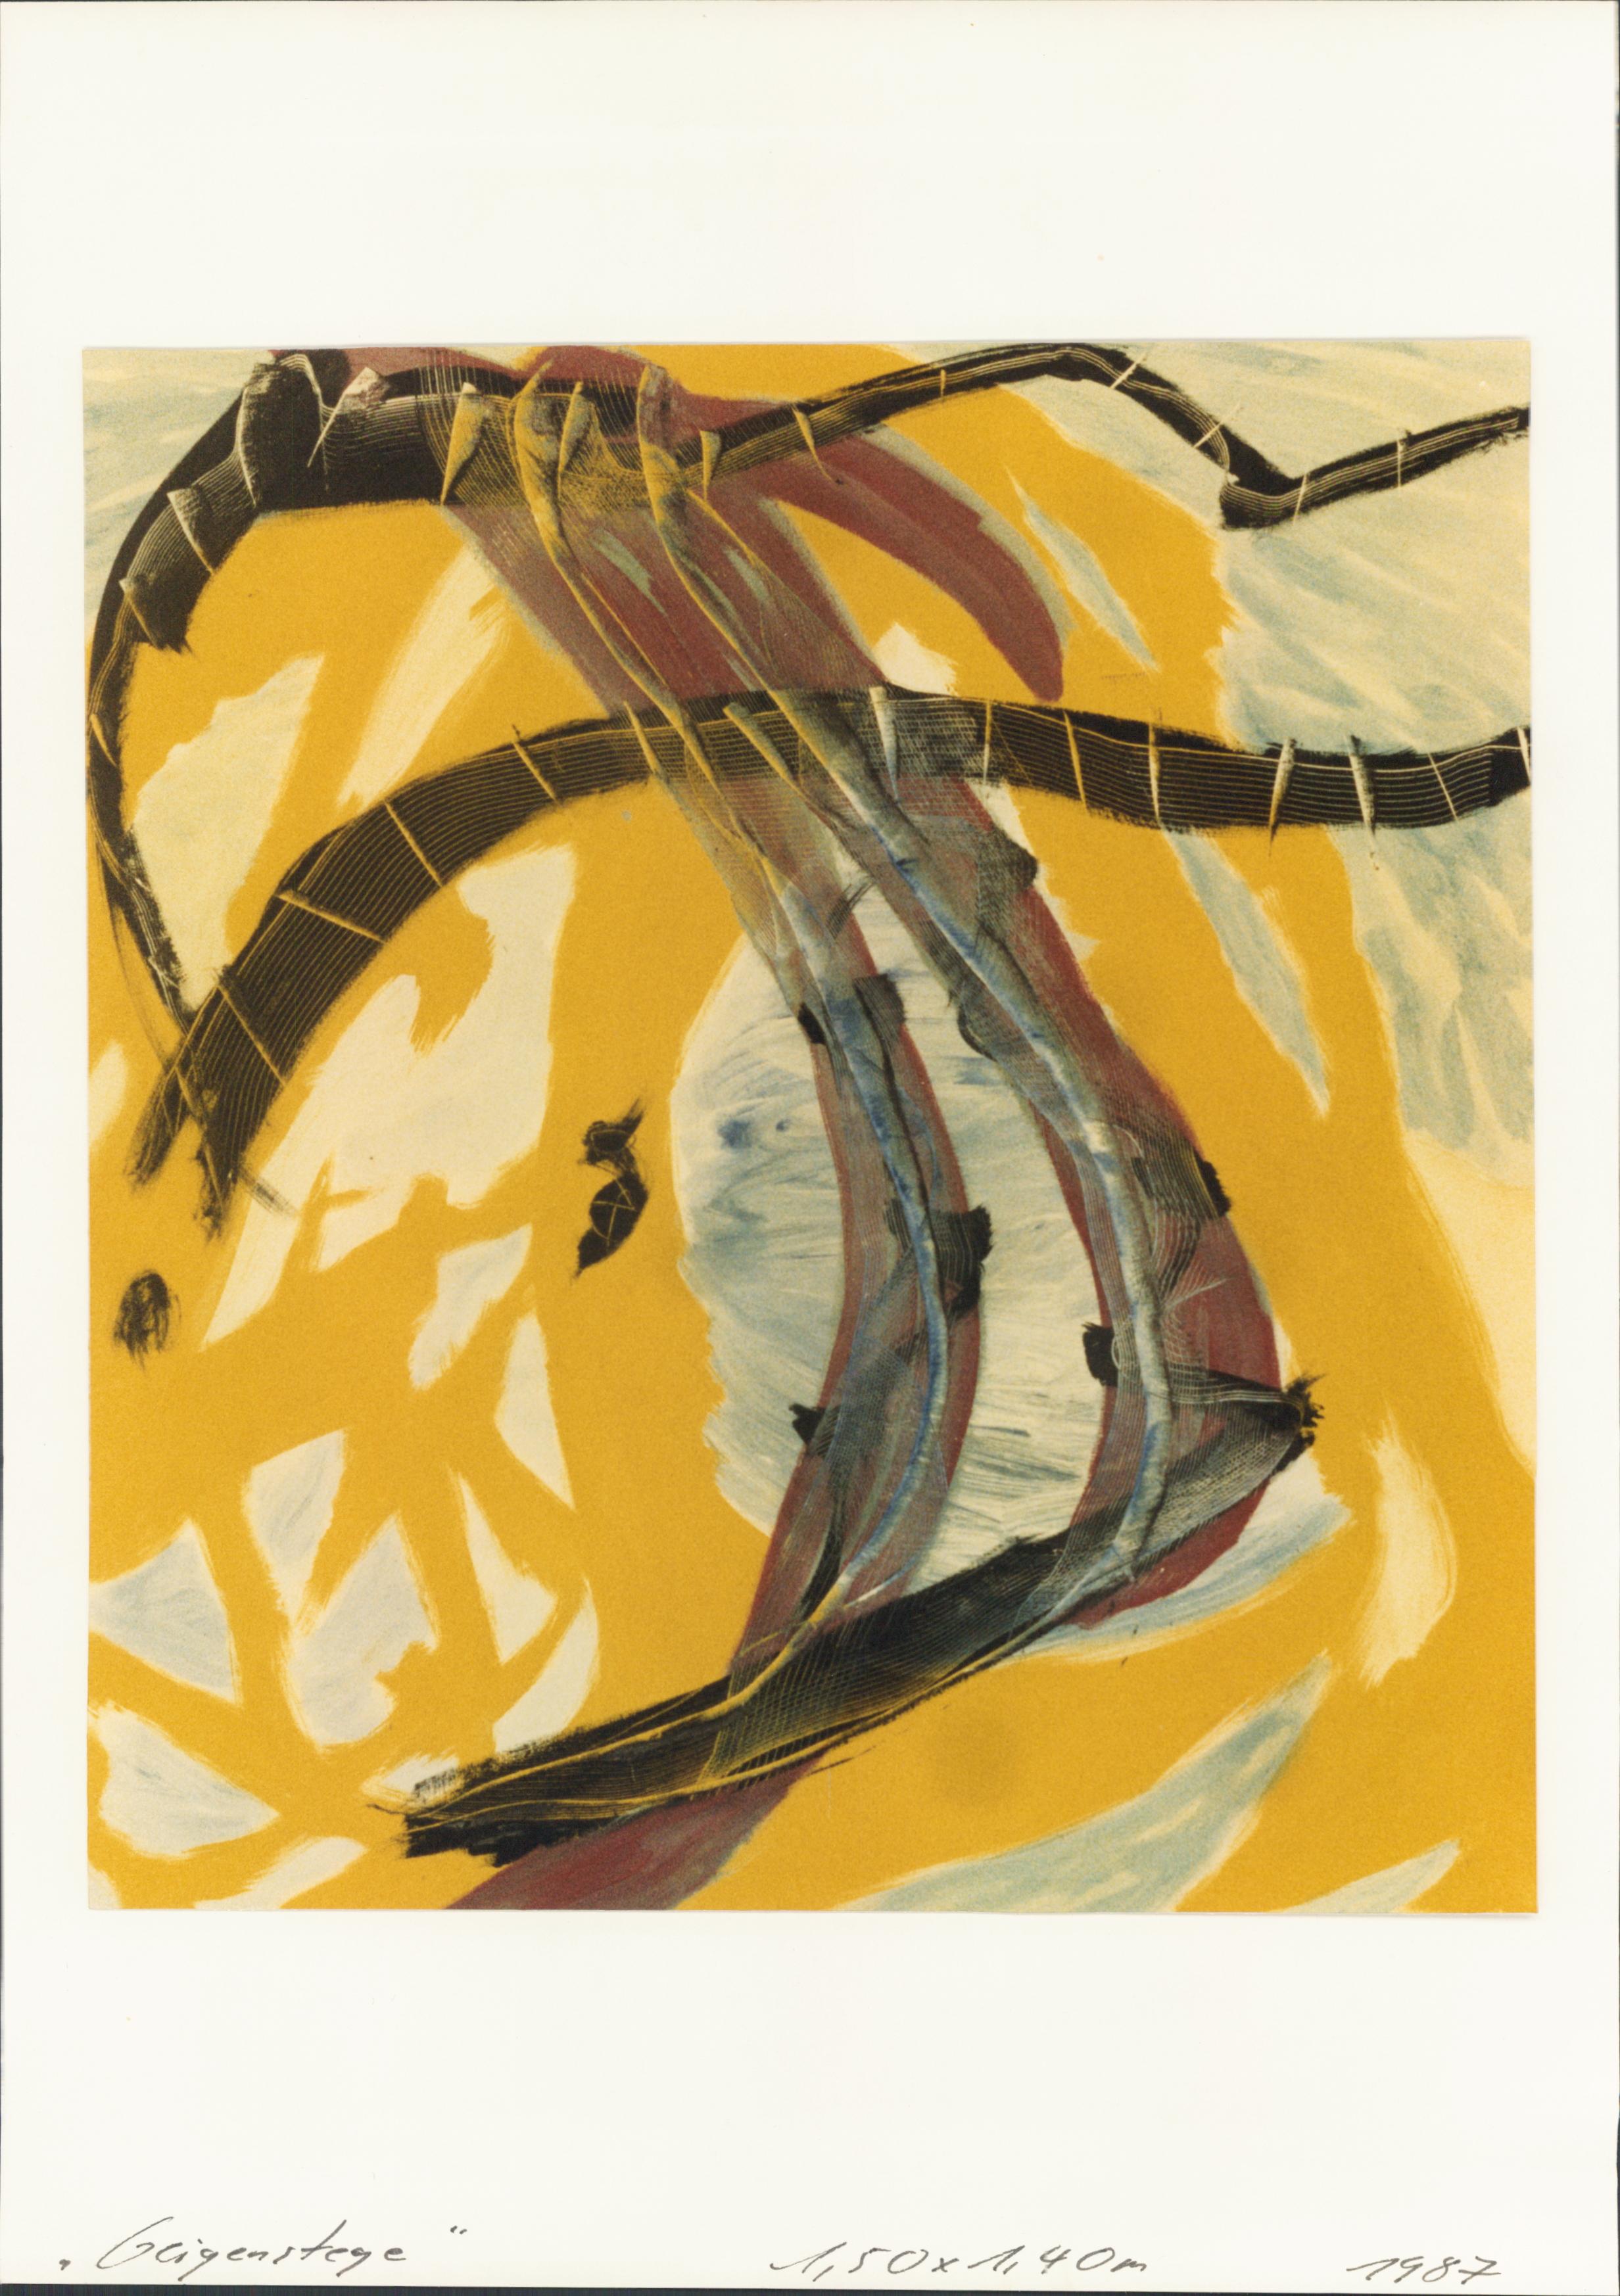 Geigenstege (1987)